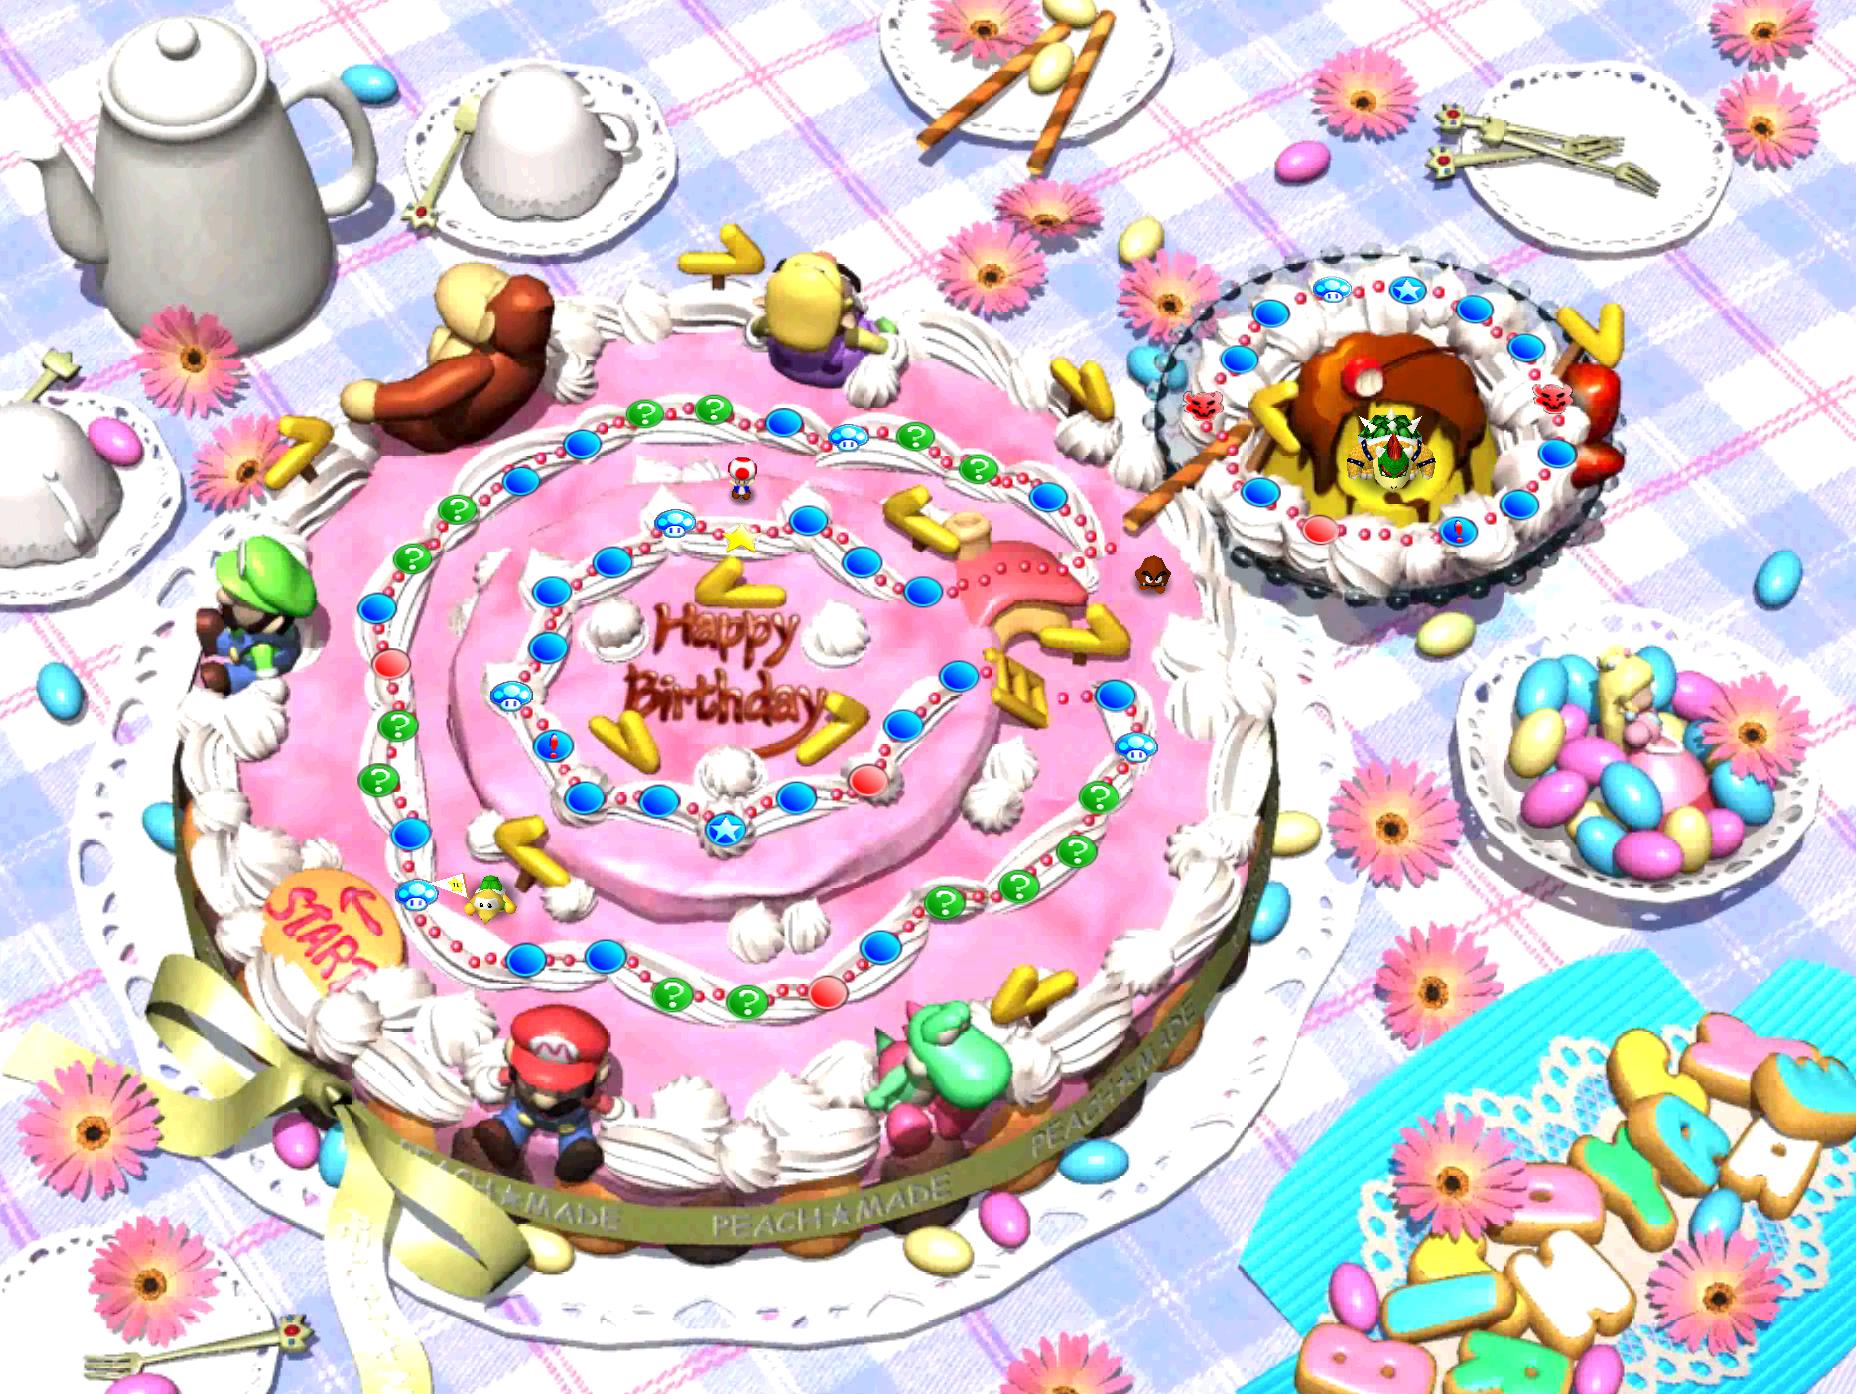 Strange Peachs Birthday Cake Mariowiki Fandom Personalised Birthday Cards Paralily Jamesorg